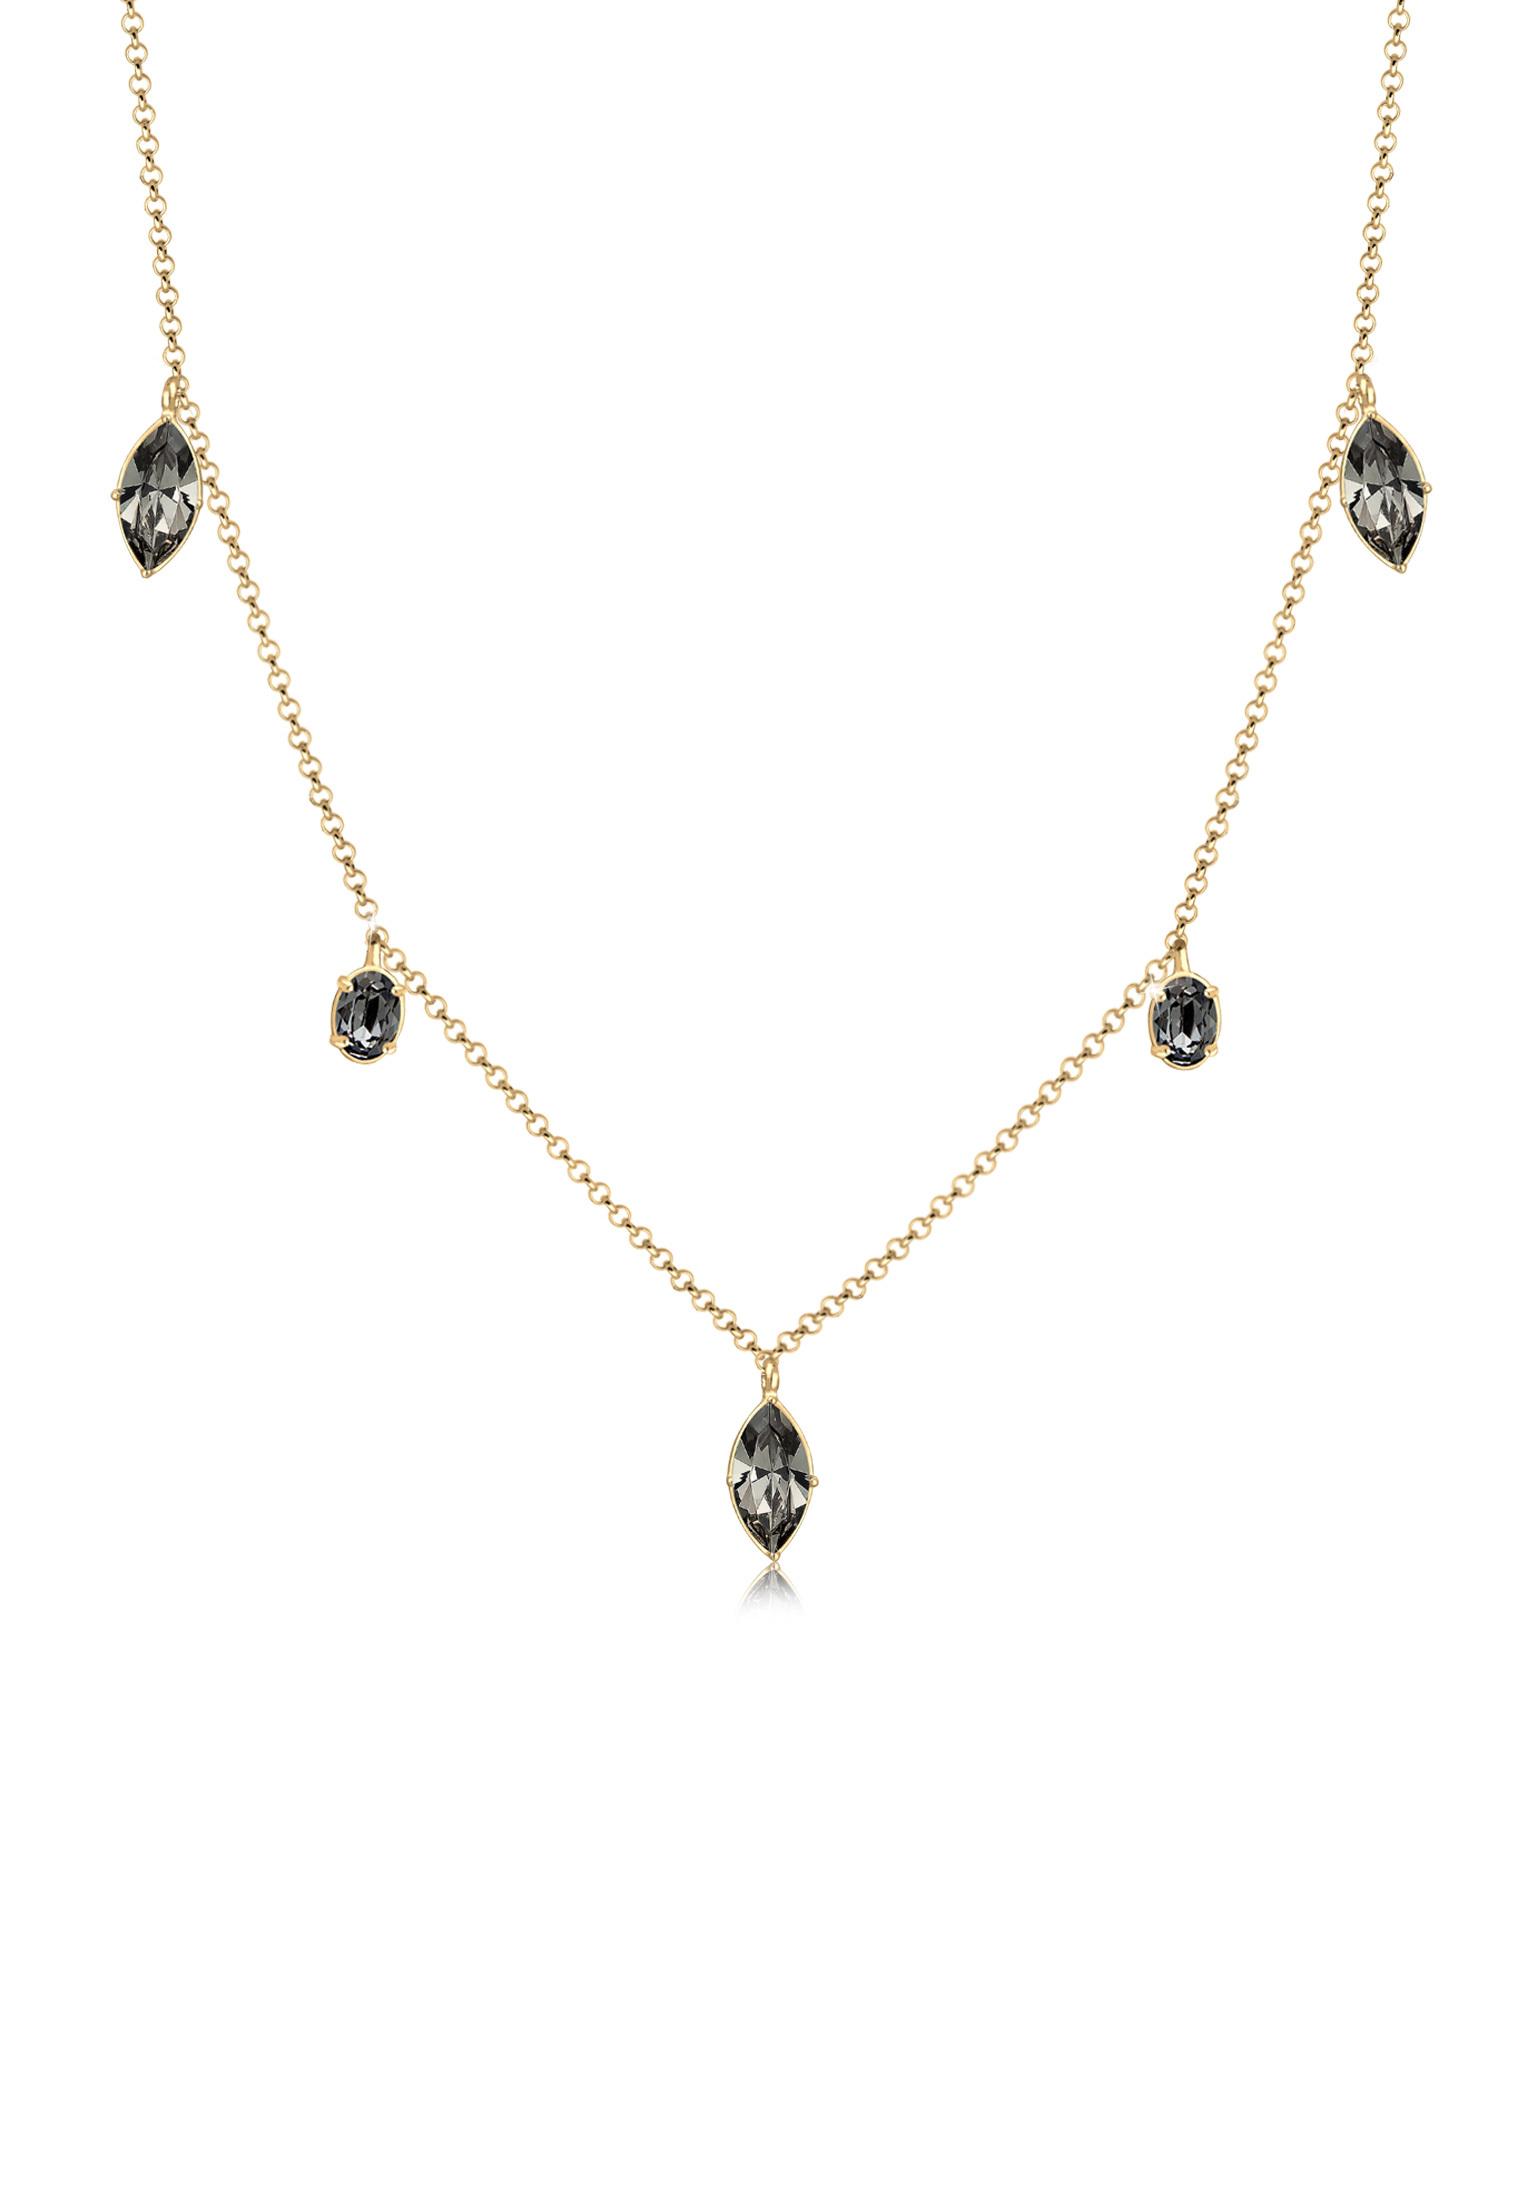 Halskette   Kristall ( Grau )   925 Sterling Silber vergoldet